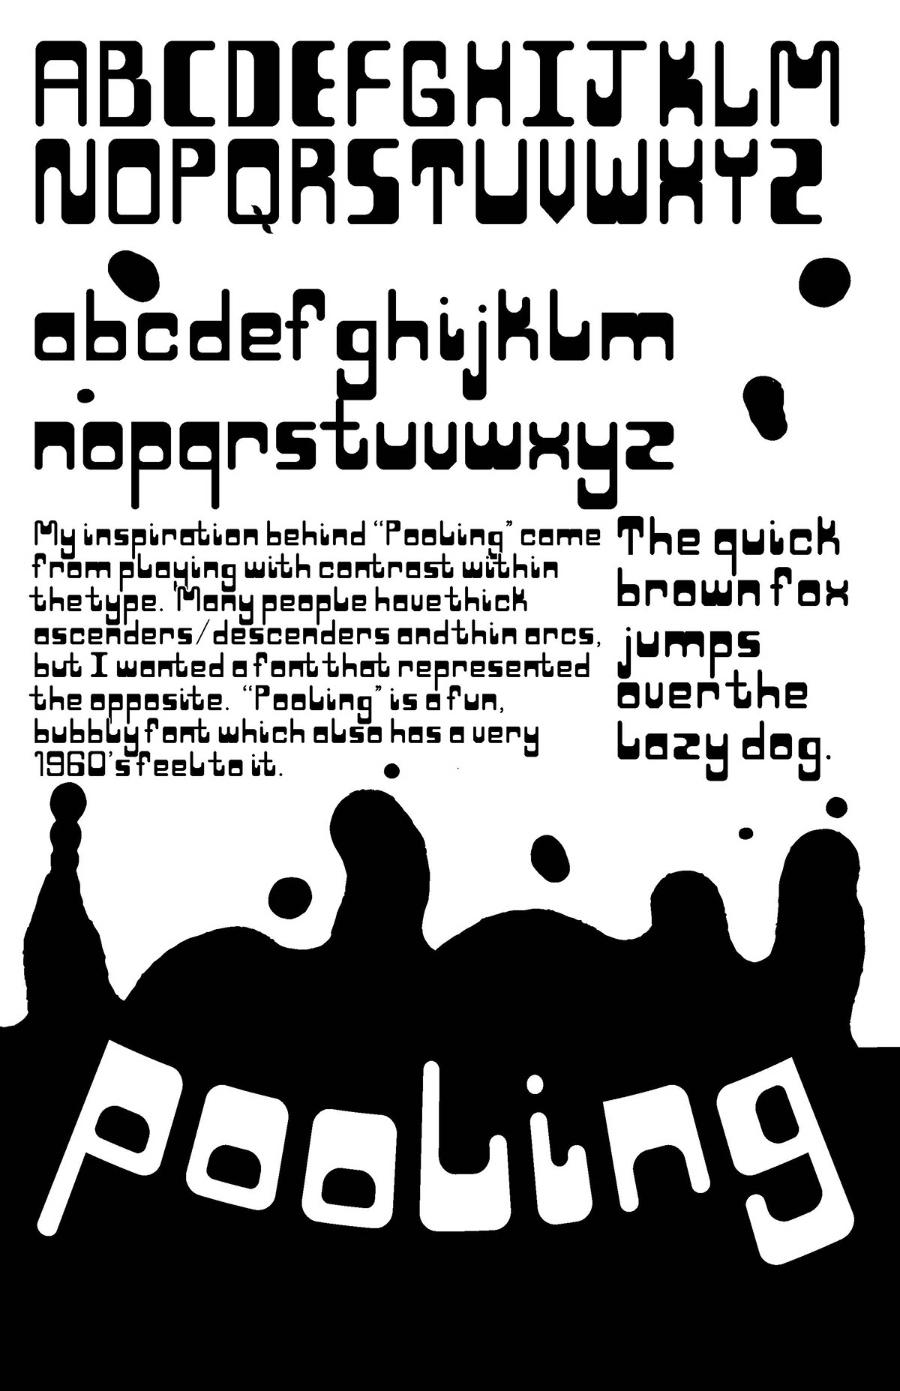 Abby-Wilhelm_Pooling-Display-Free-Typeface_240317_prev02-1